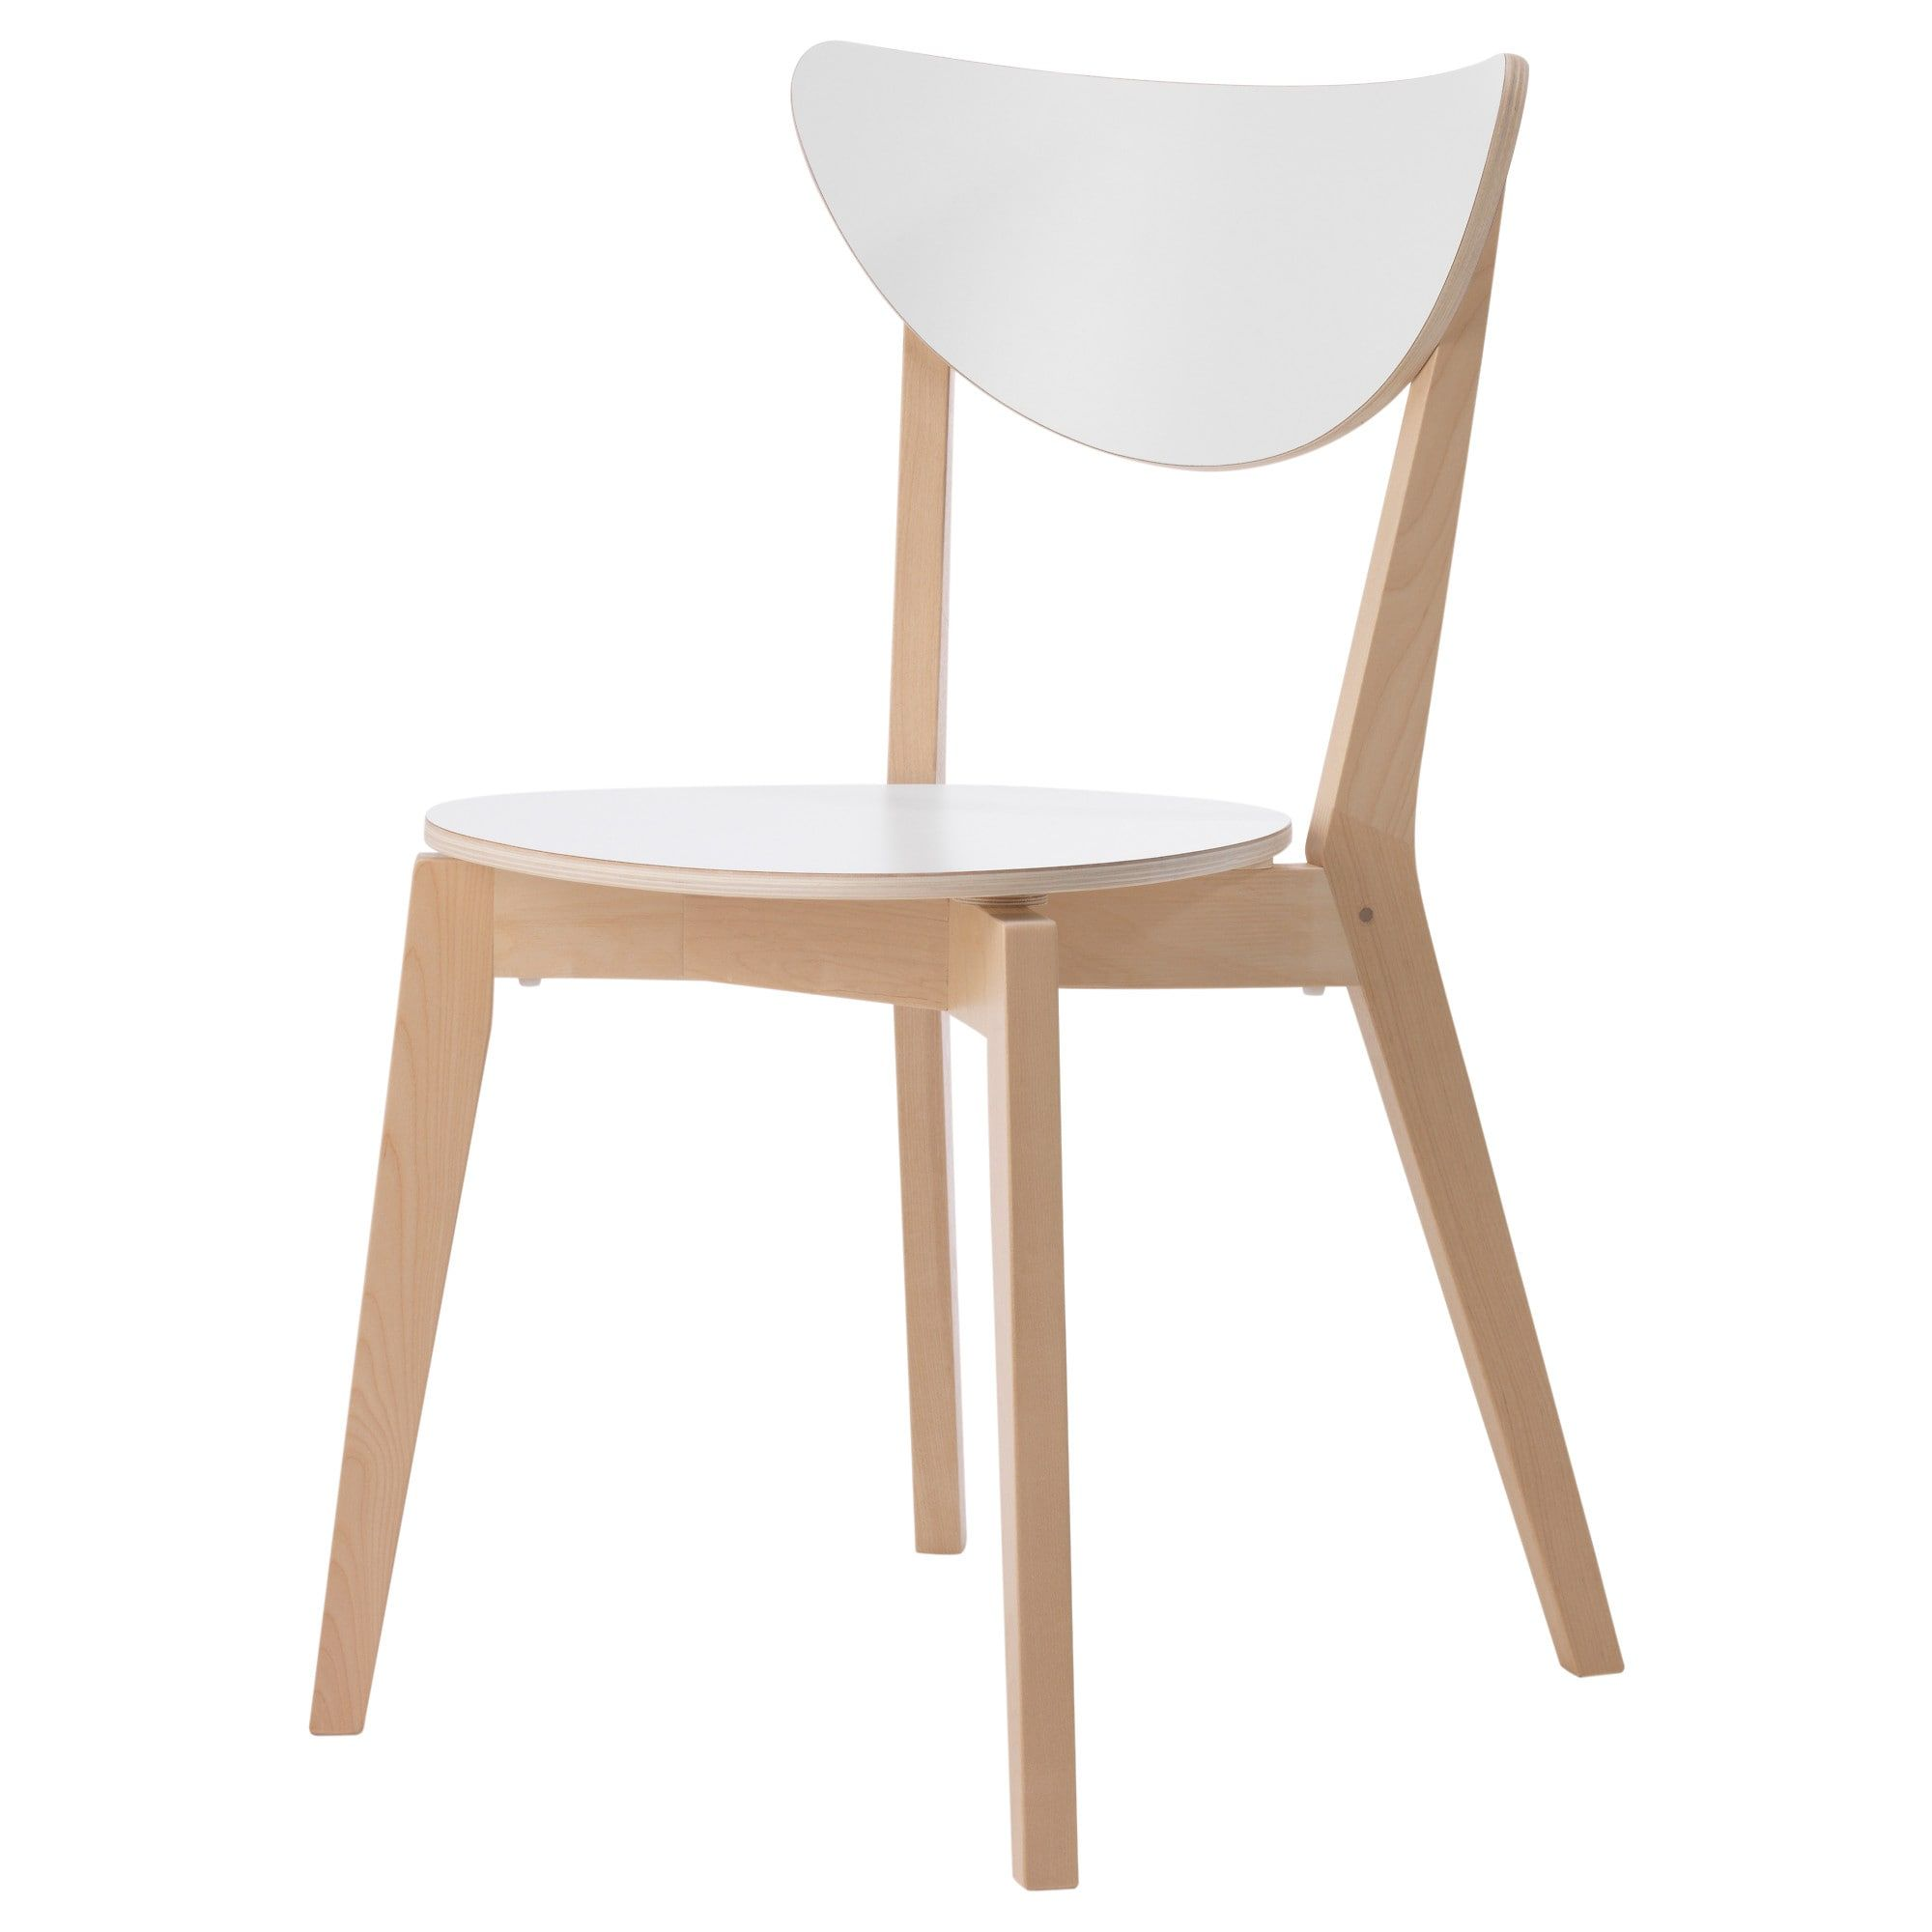 Nordmyra Chaise Blanc Bouleau Ikea Sedie Bianche Sedia Ikea Sedie